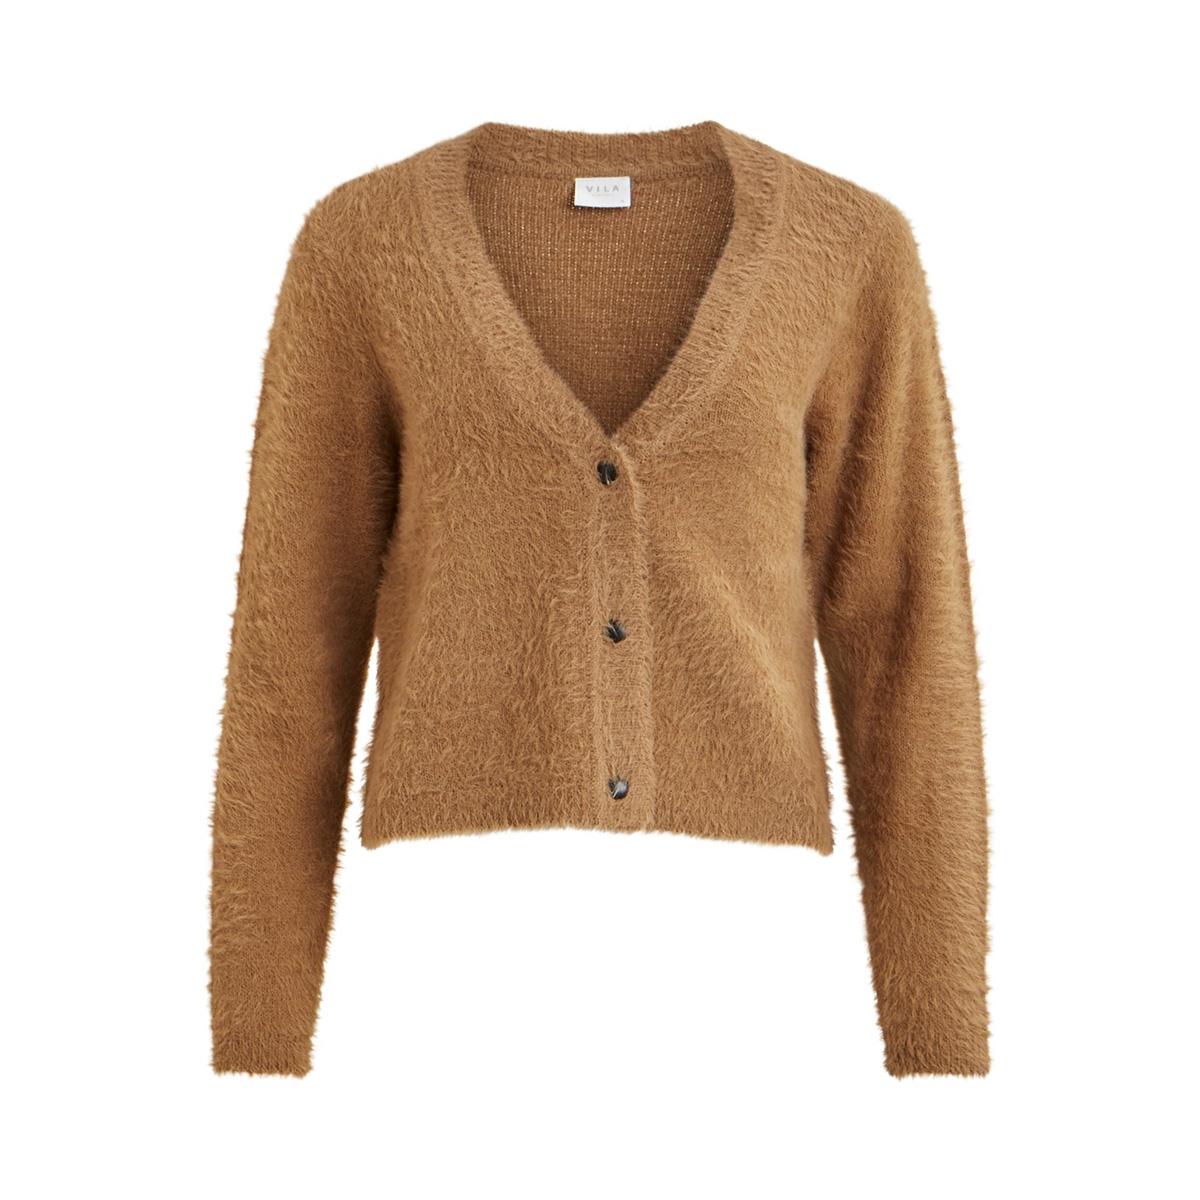 vialinja knit l/s cardigan/des 14053562 vila vest tigers eye